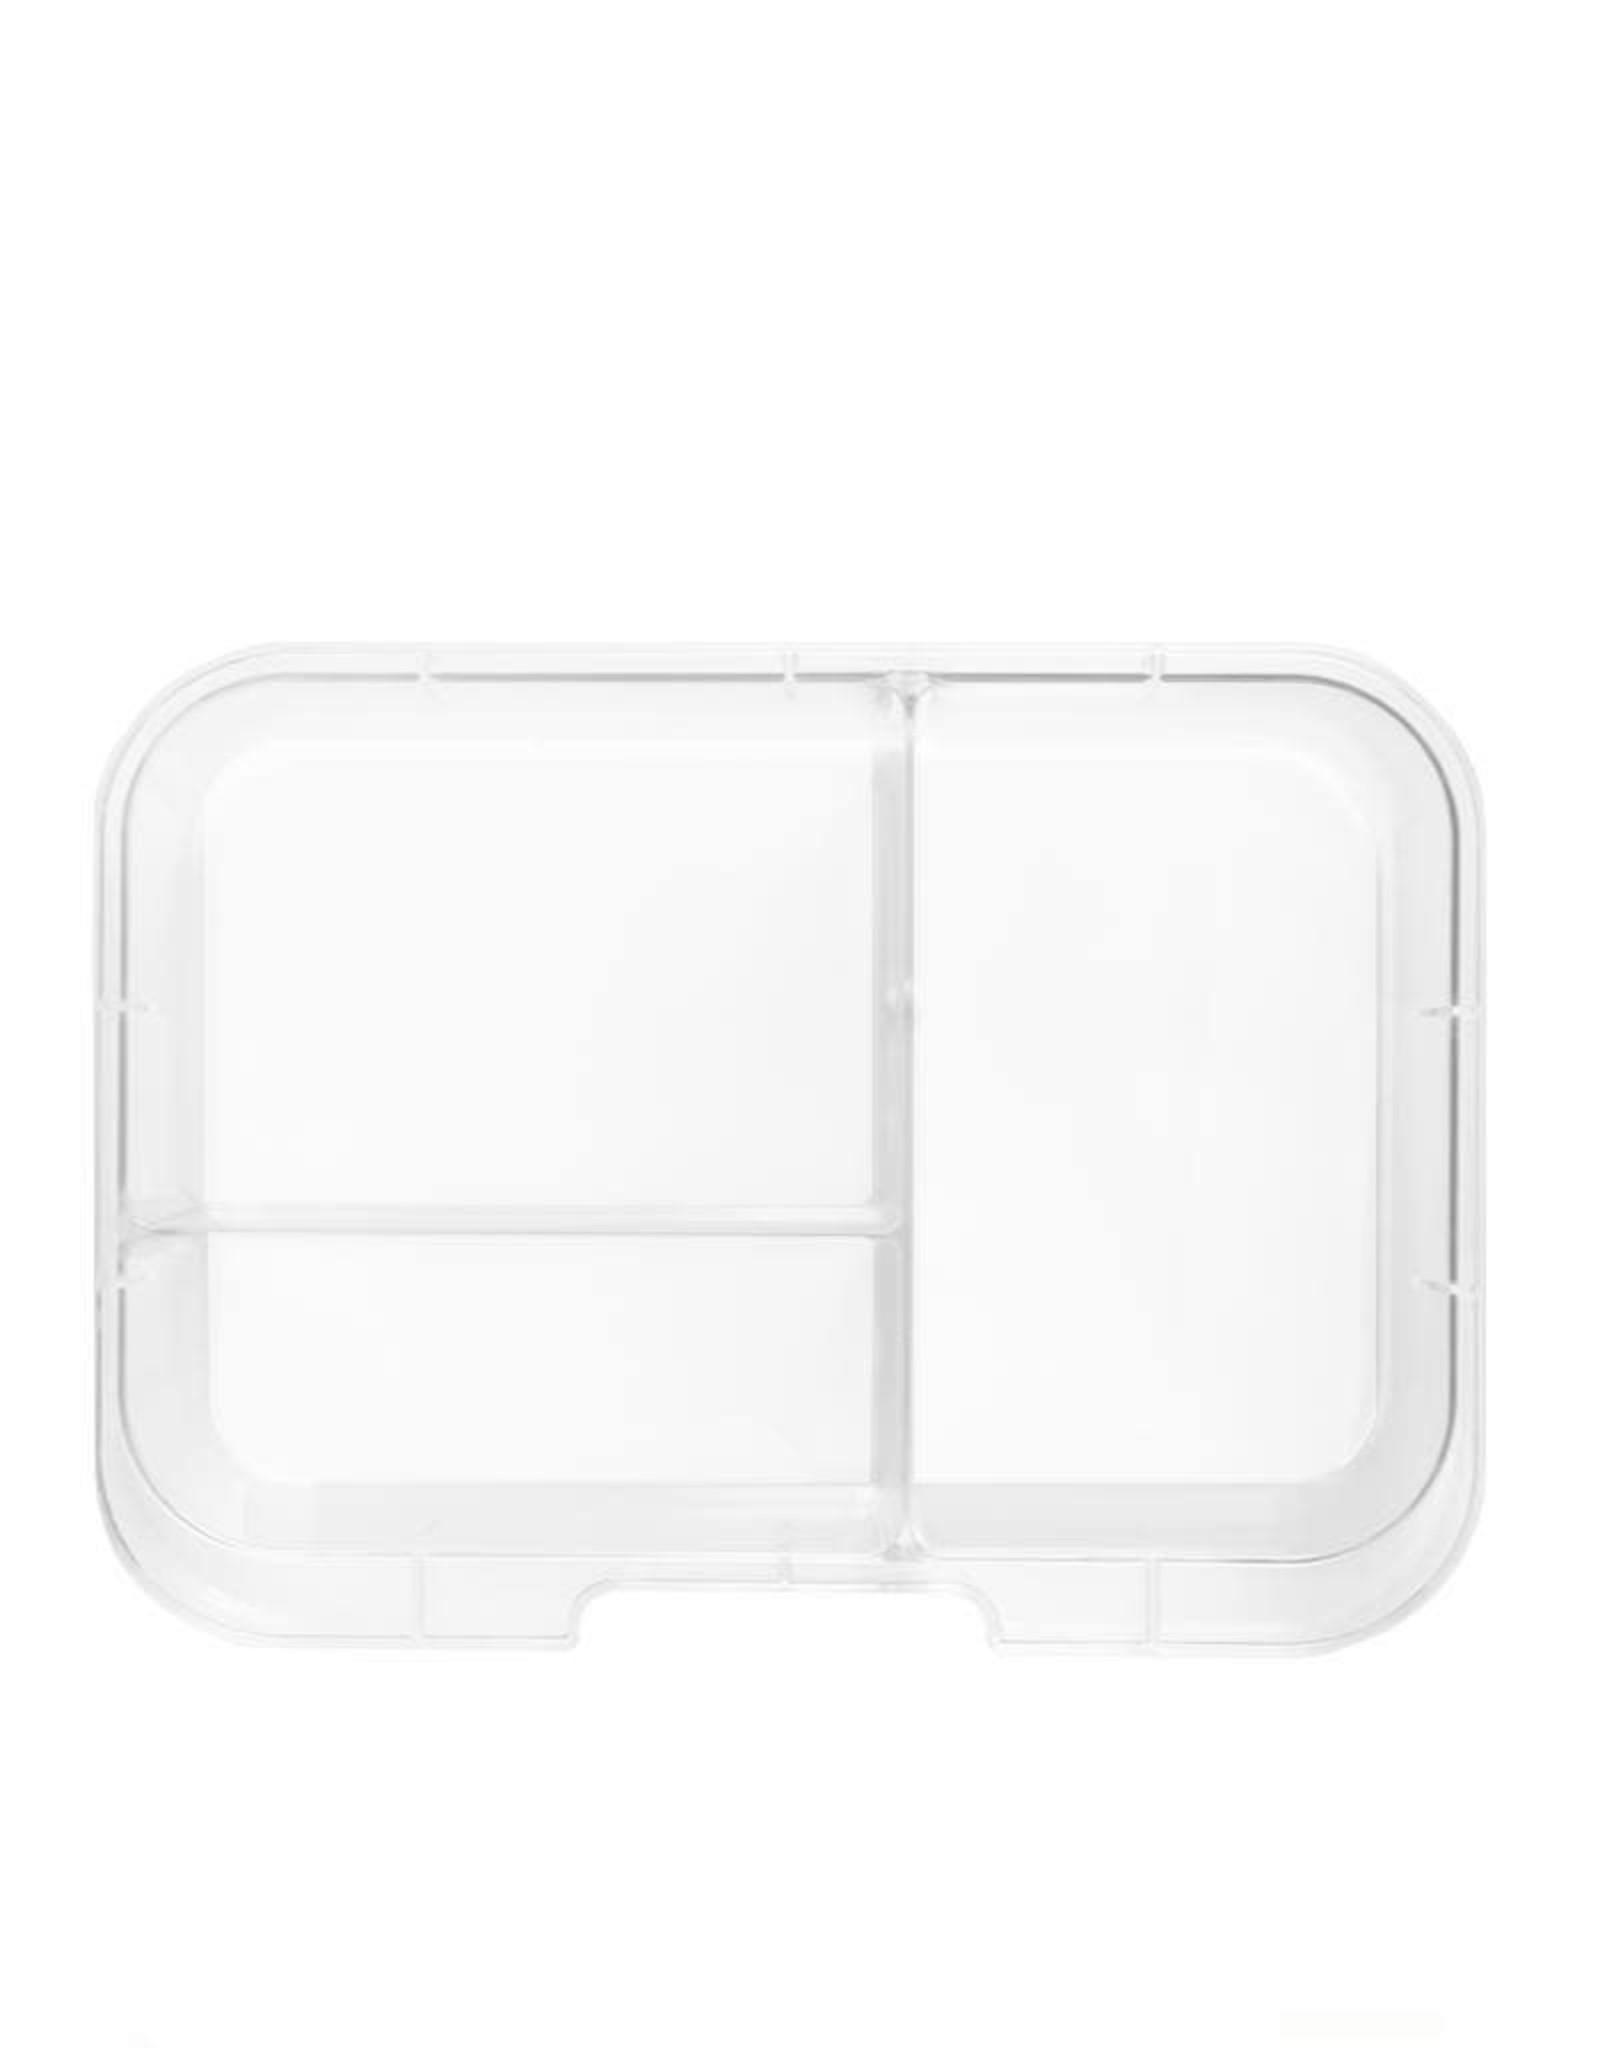 Munchbox Munchbox Bento Mega 3 - Clear Tray